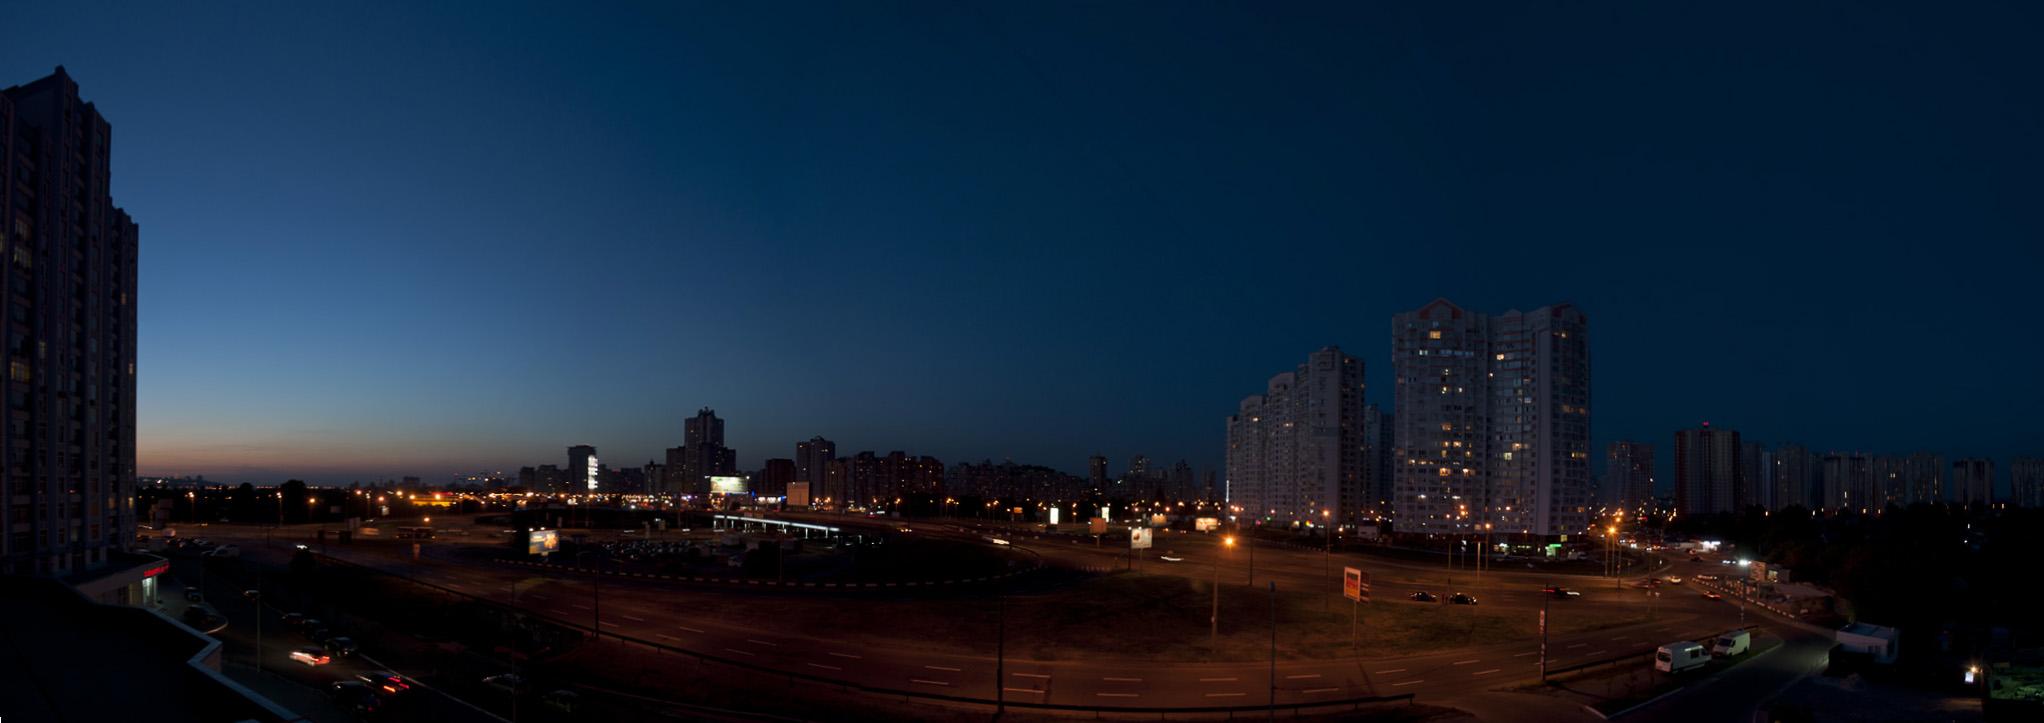 Night_Kiev